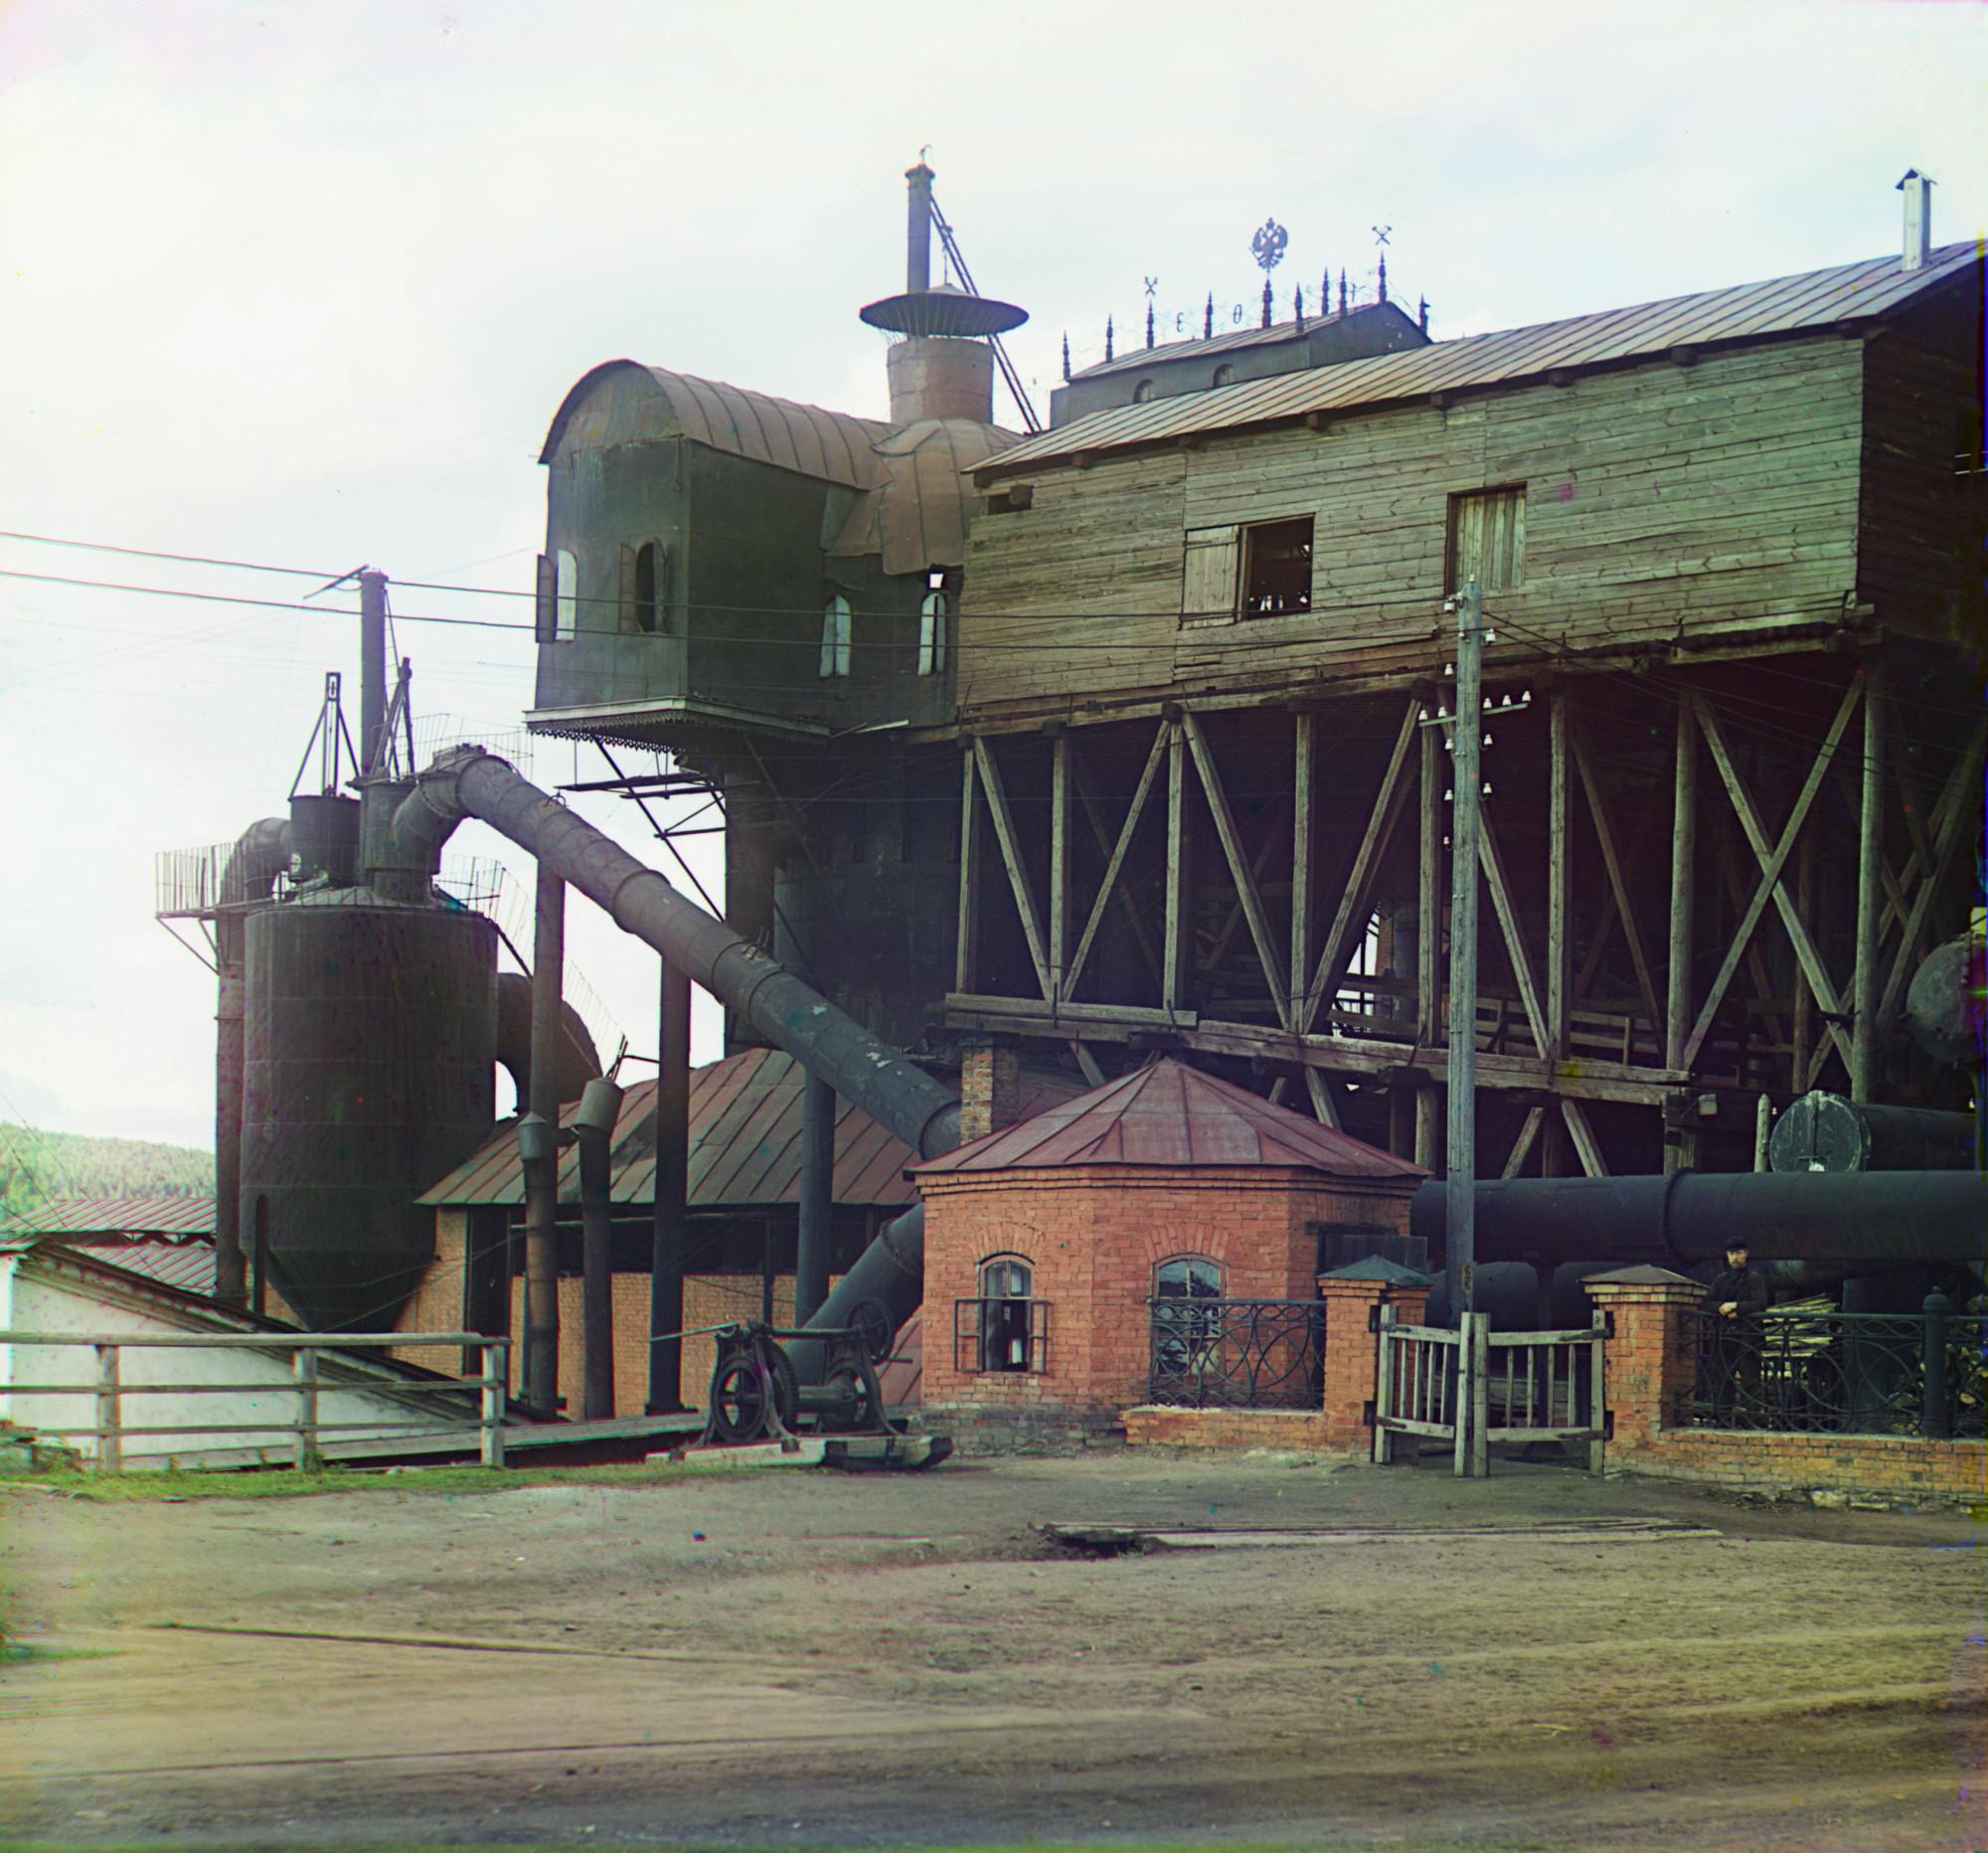 20 век в цвете. 1910 г. Краски мира 110 лет назад 1910-е,autochrome,color separation,20 век в цвете